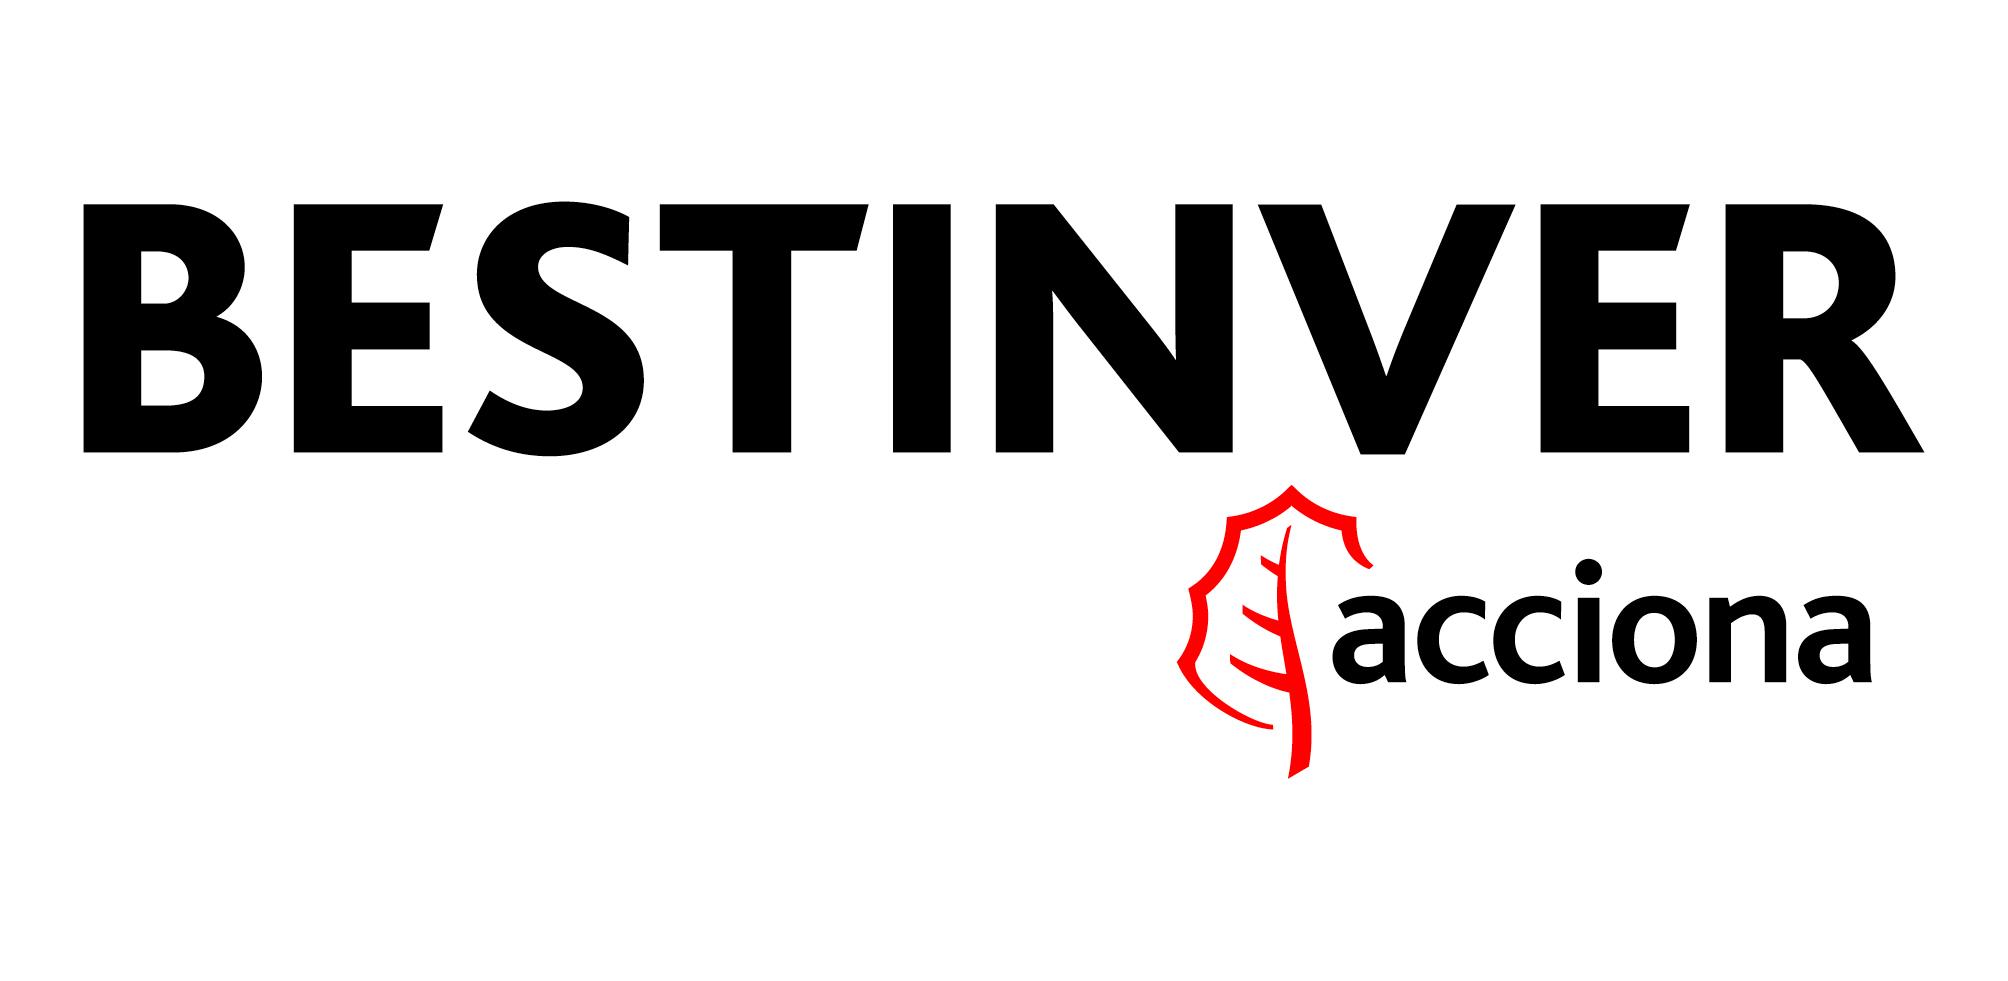 BESTINVER logotipo Rankia